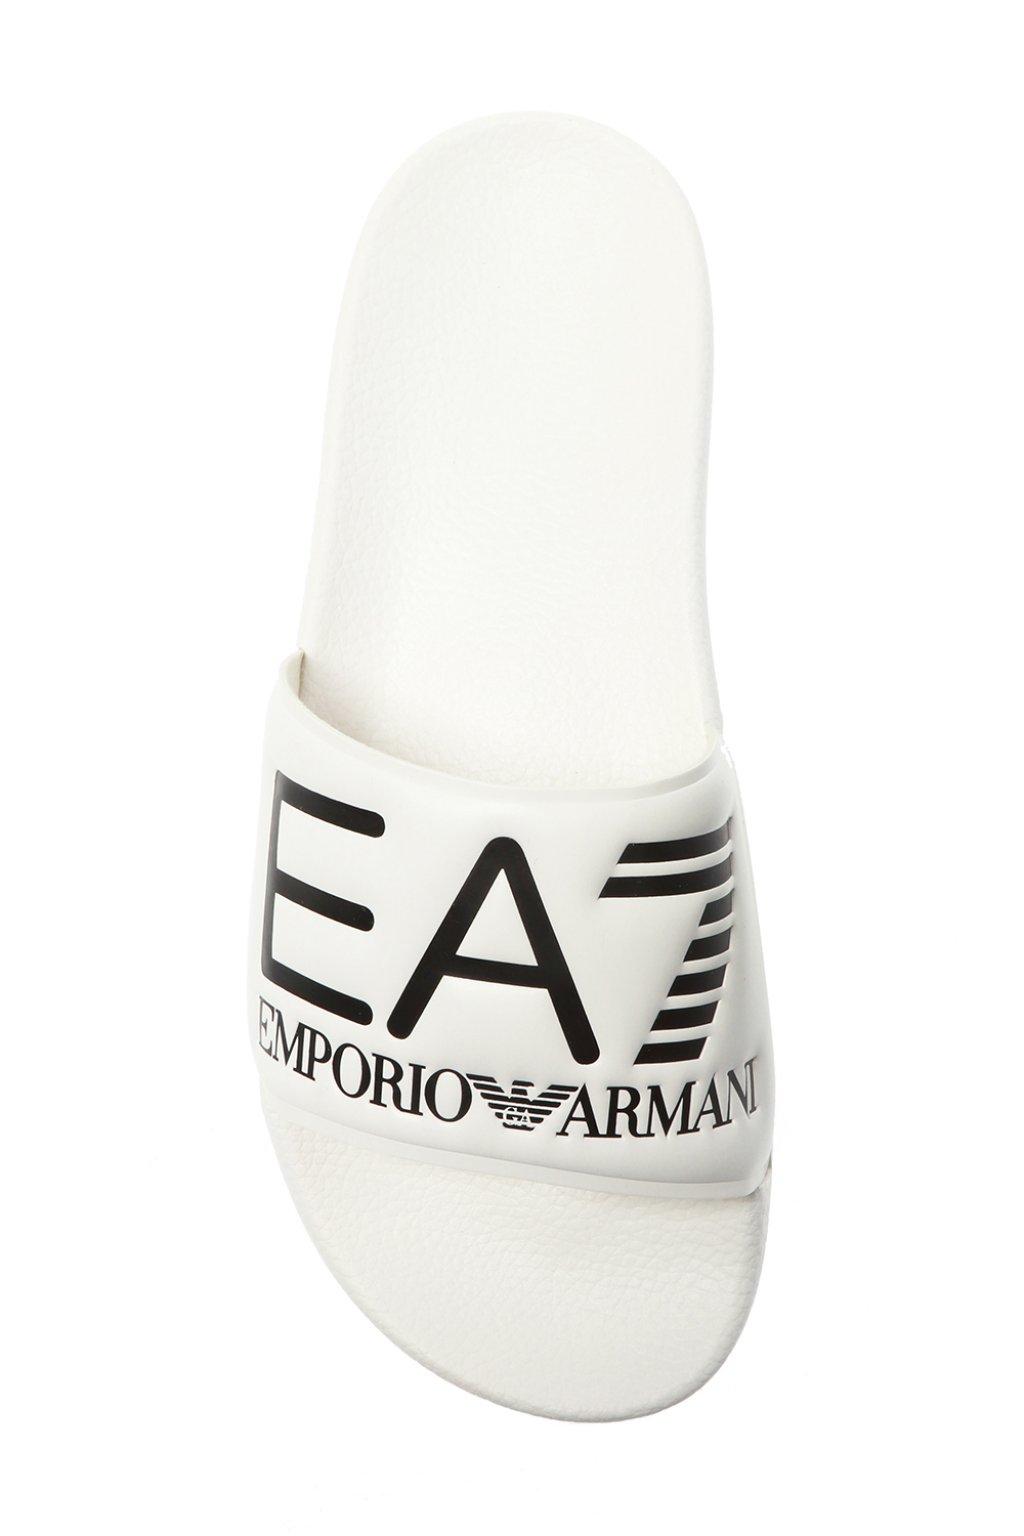 EA7 Emporio Armani Logo-embossed slides